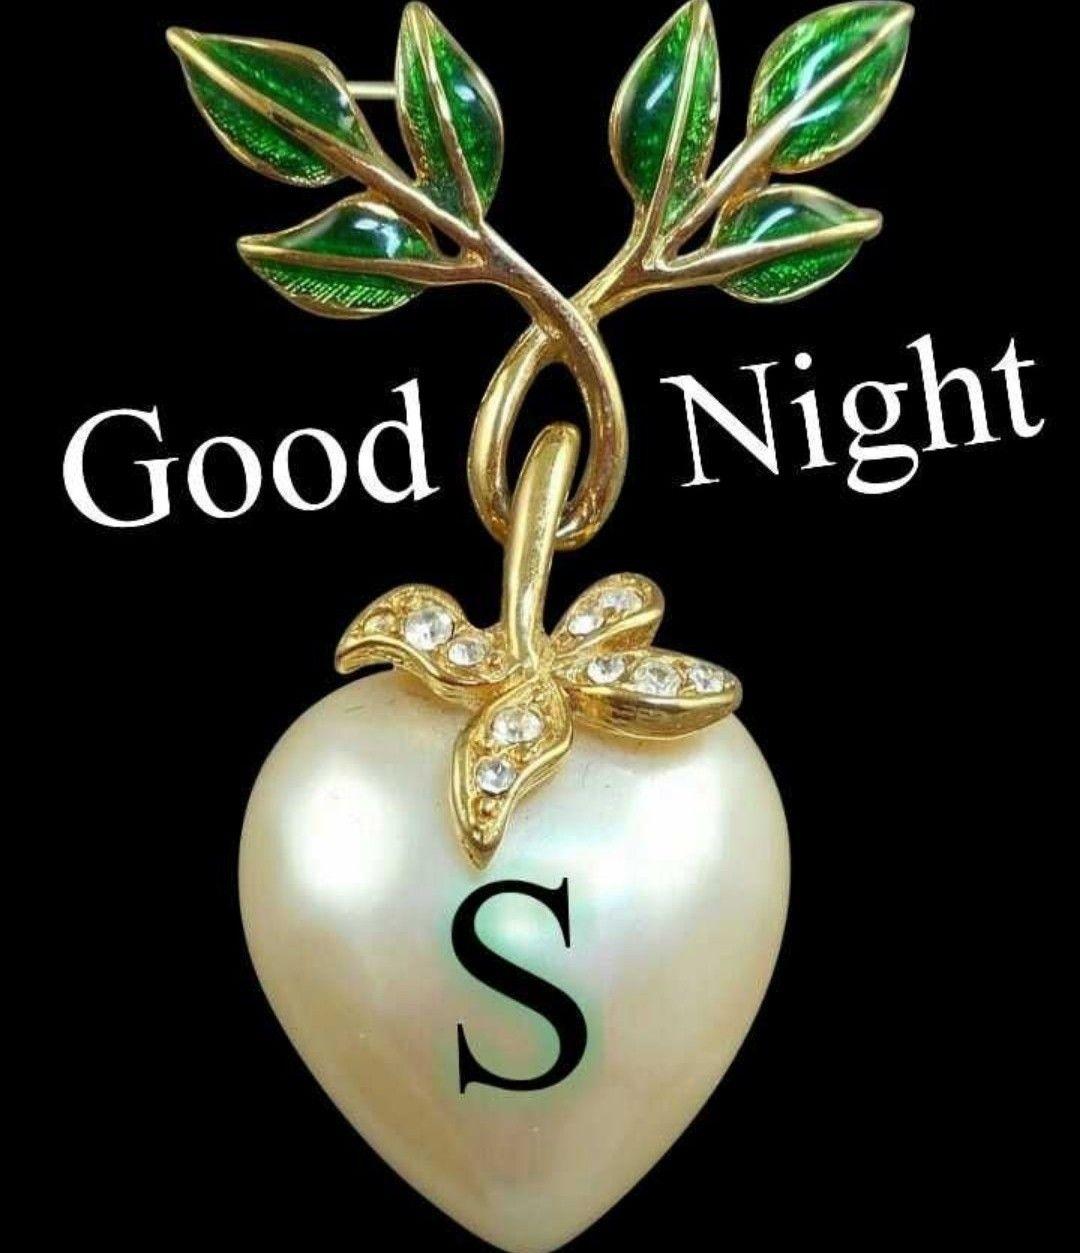 Letter S Good Nigt Good Night Love Images Good Night Good Night Wallpaper